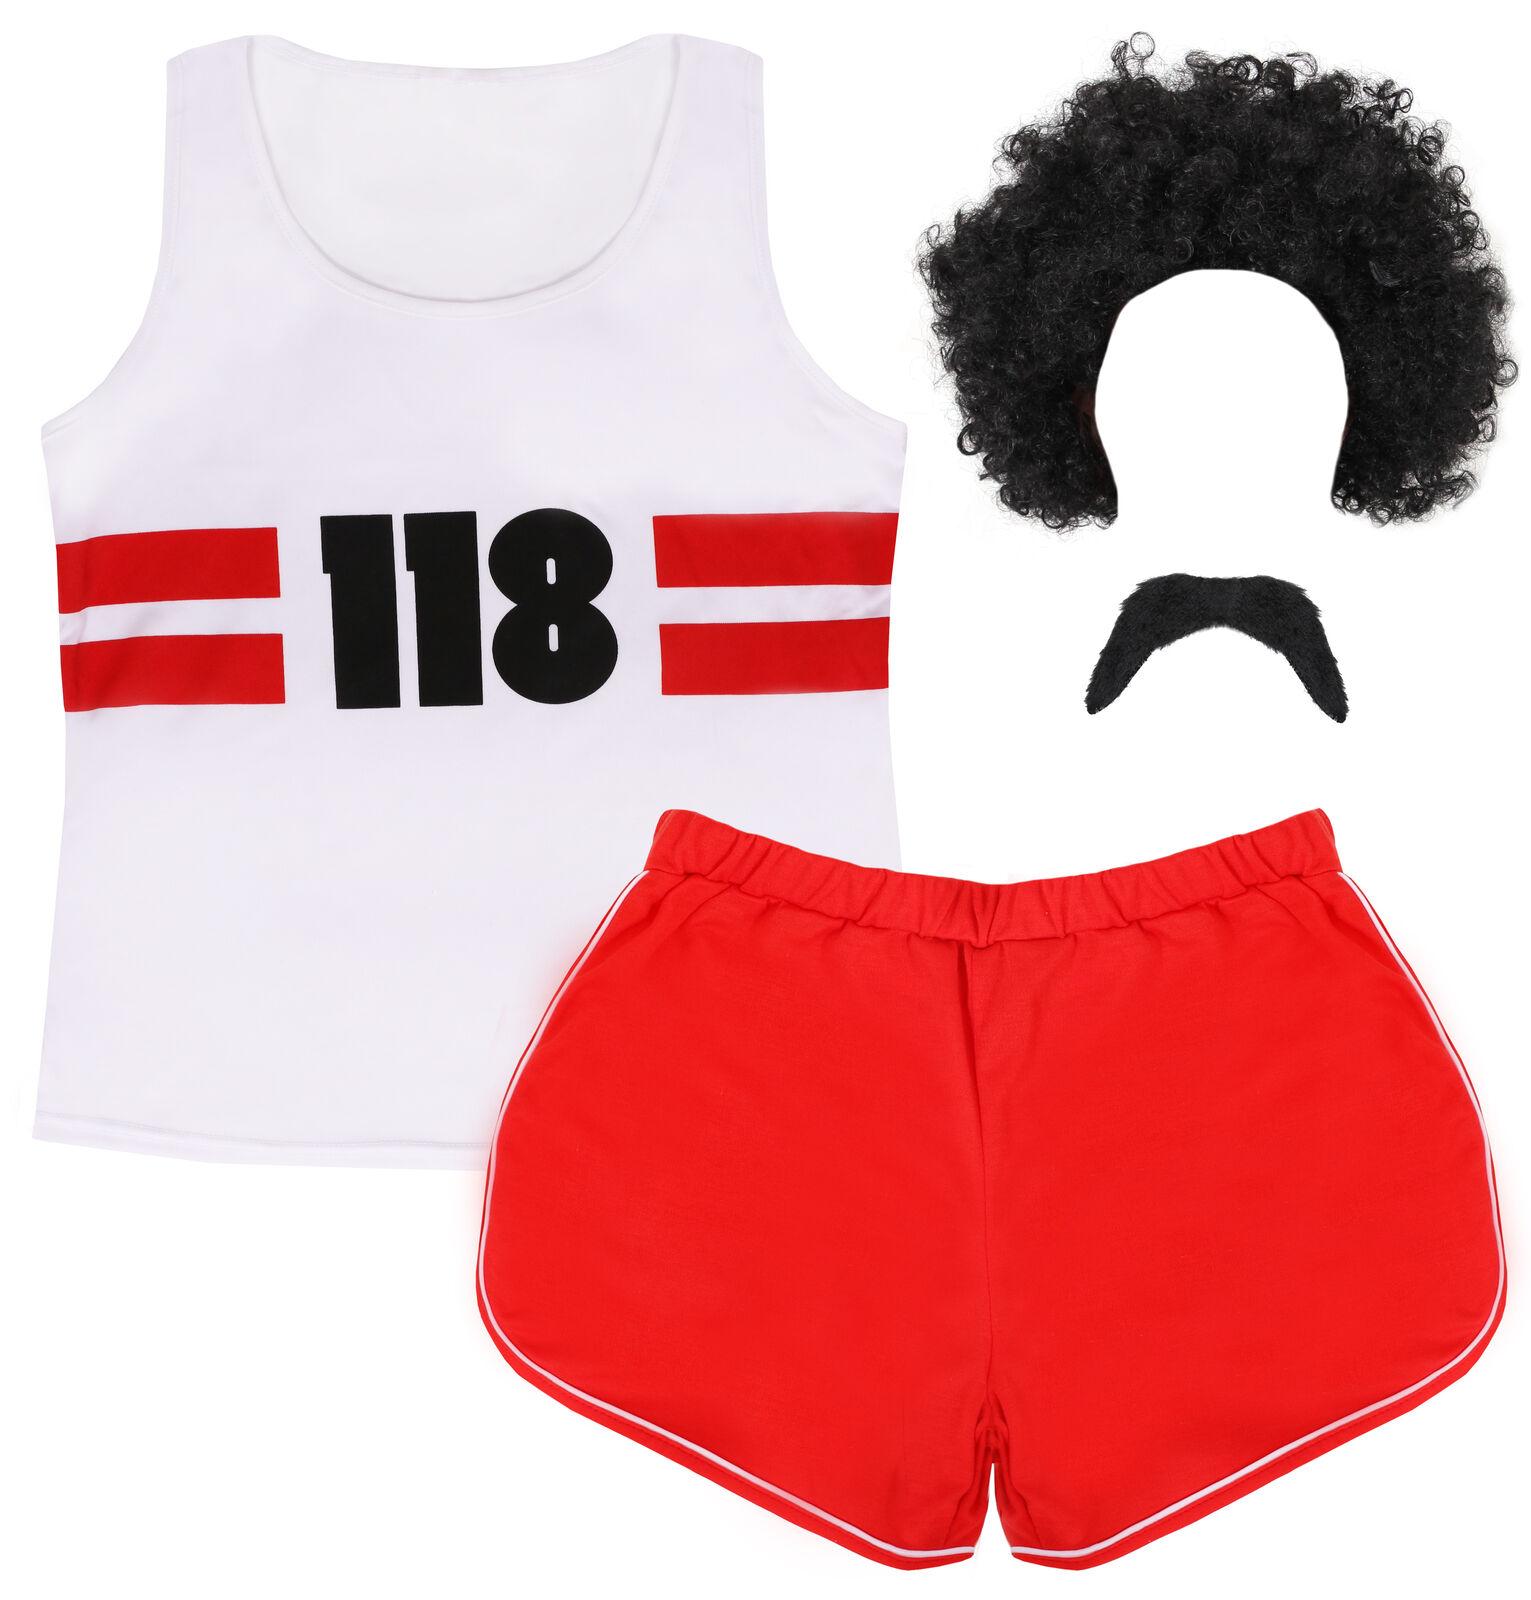 75 Men/'s Fancy Dress 118 Costume TV Advert Fun Run Marathon Outfit Stag Hen